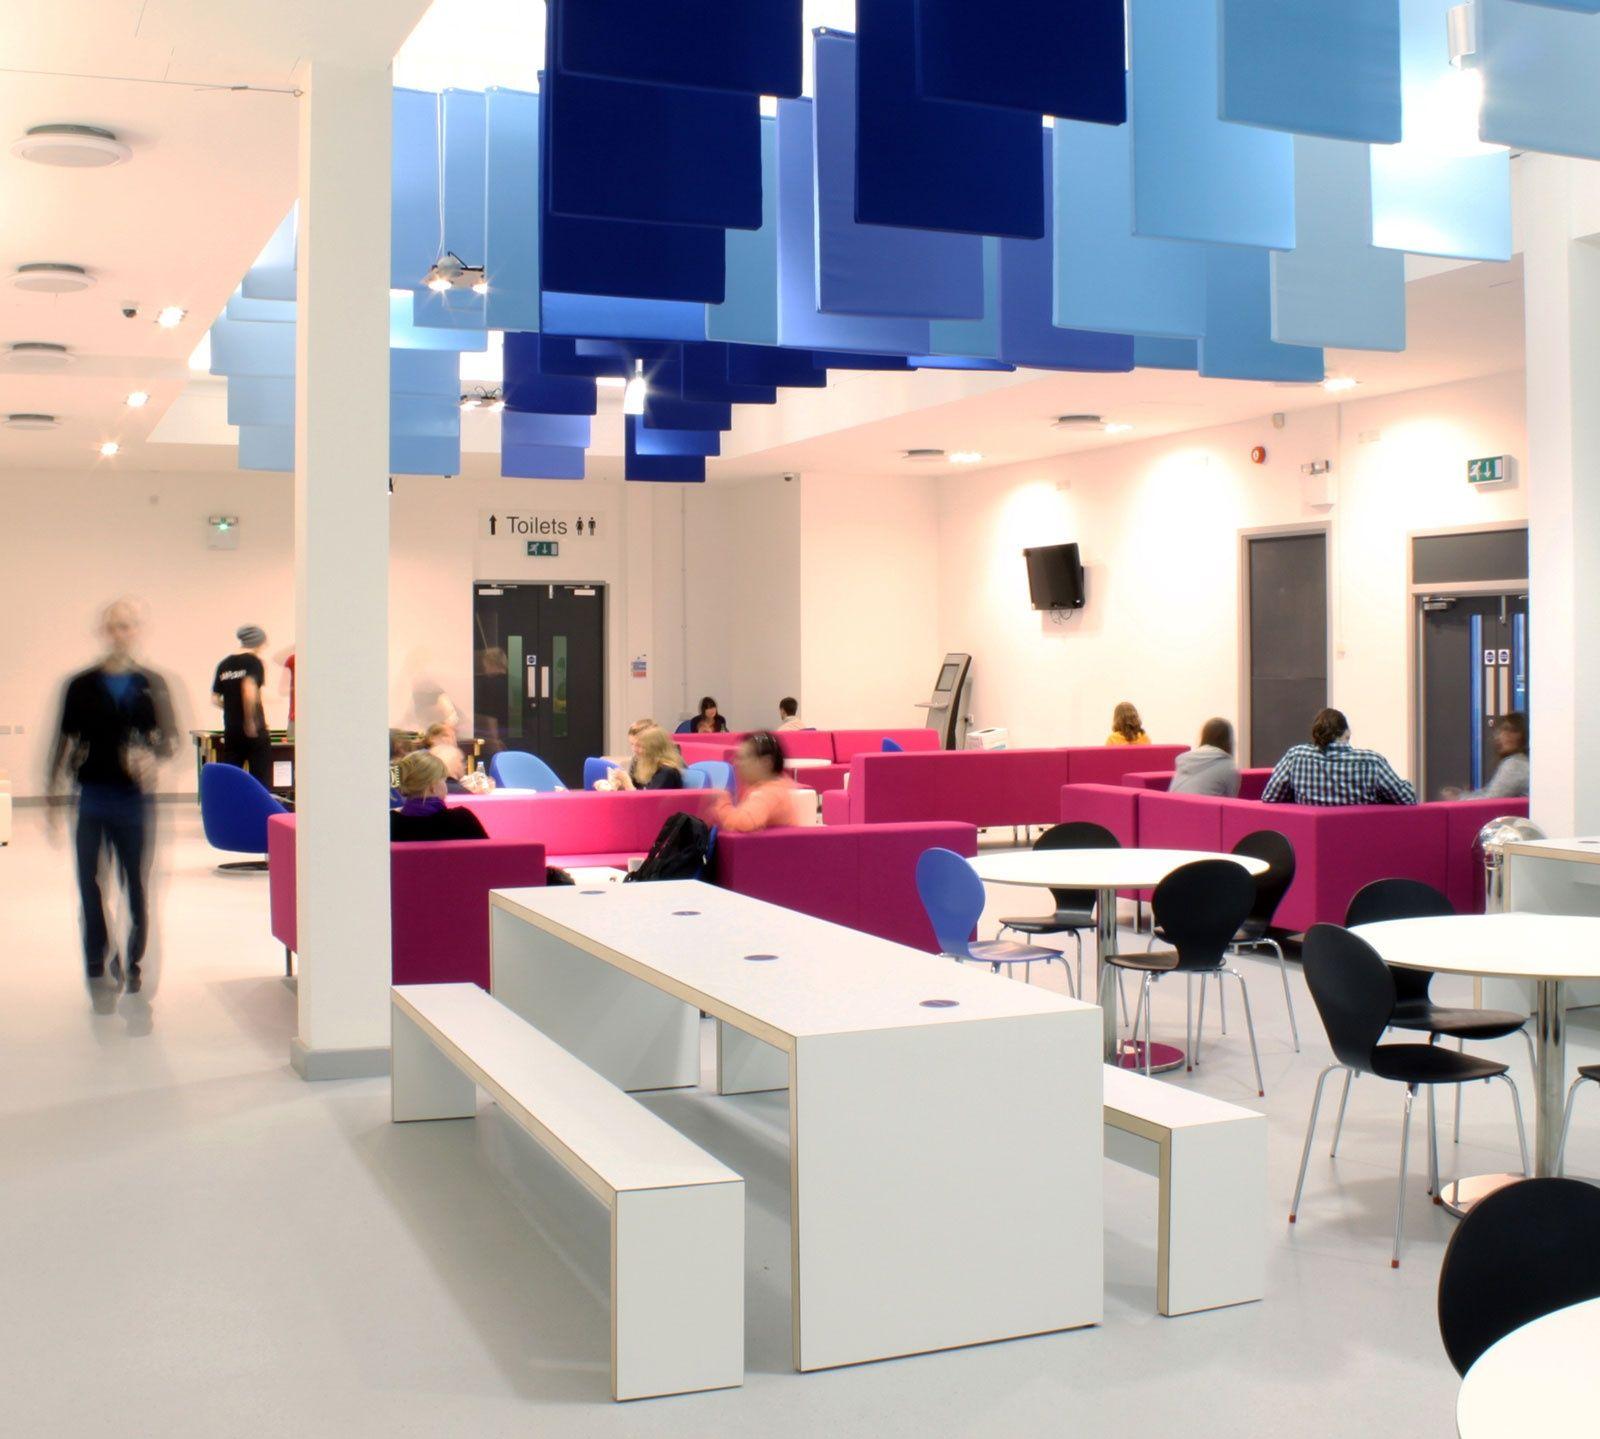 Eduction space design university design university of portsmouth interiors for the third for Interior design courses brisbane